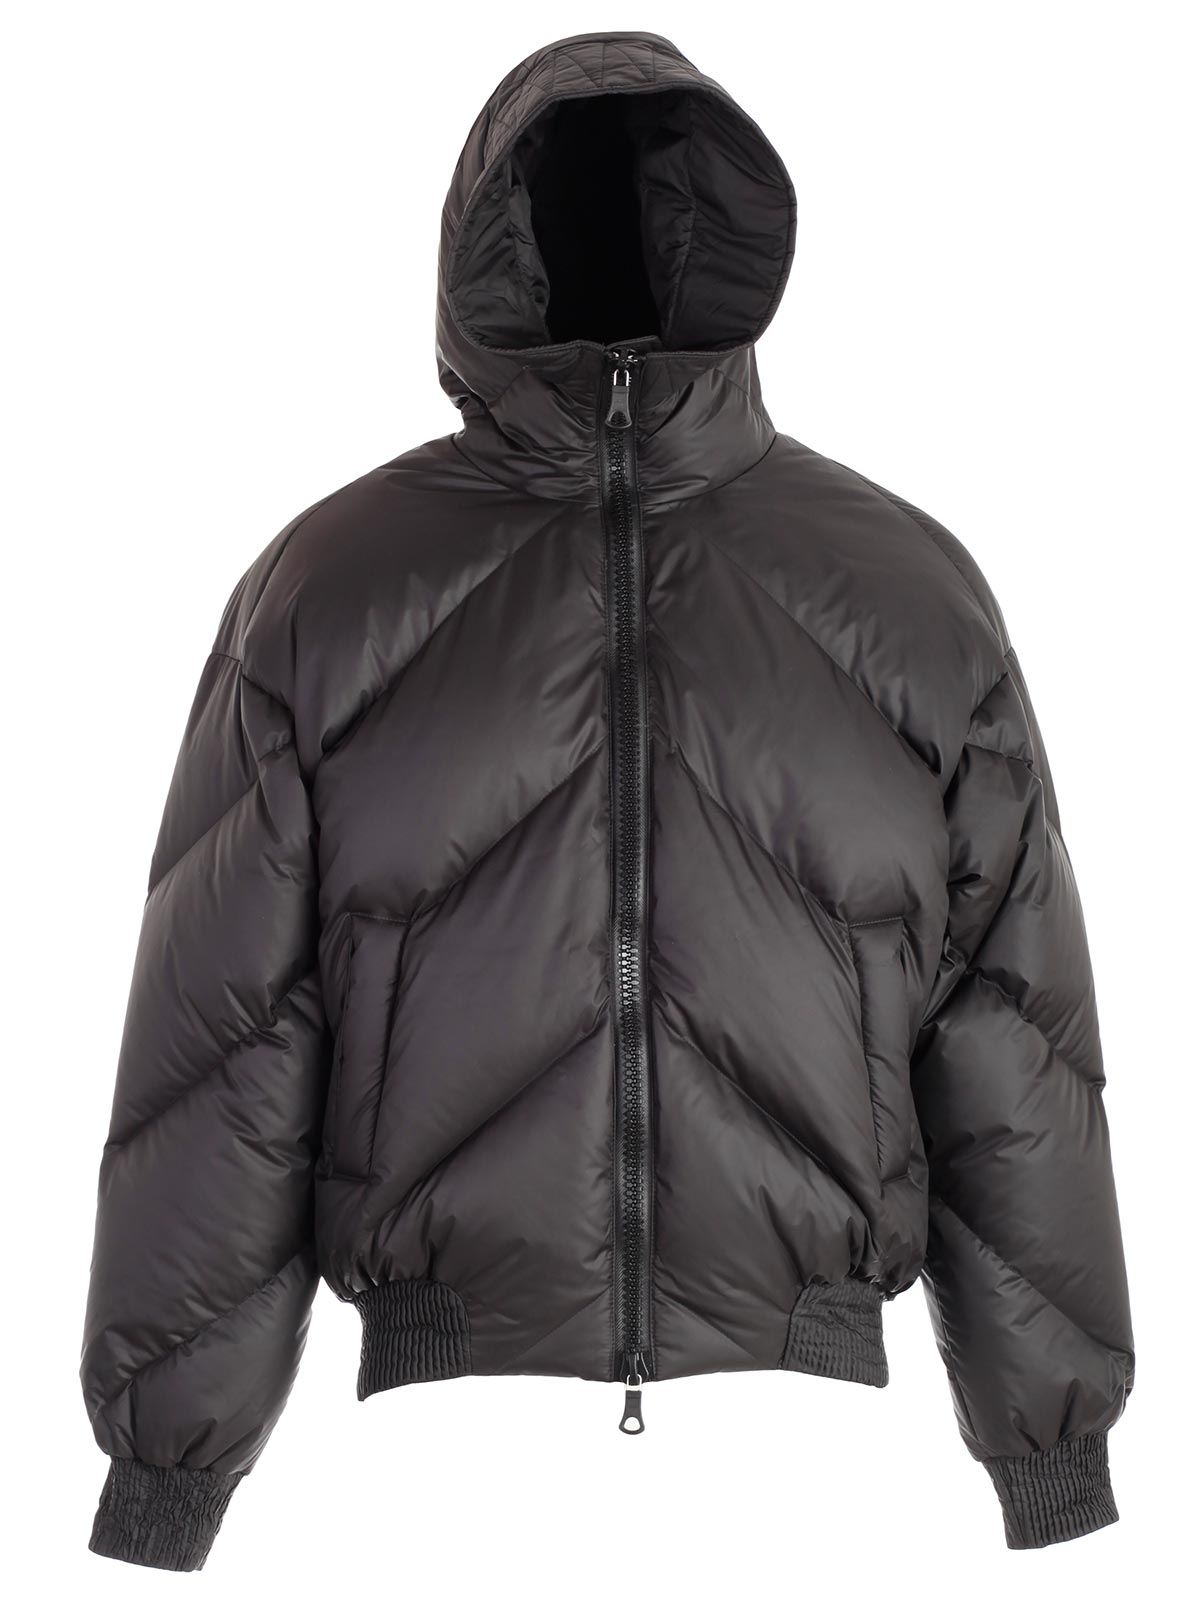 Picture of Ienki Ienki Jacket